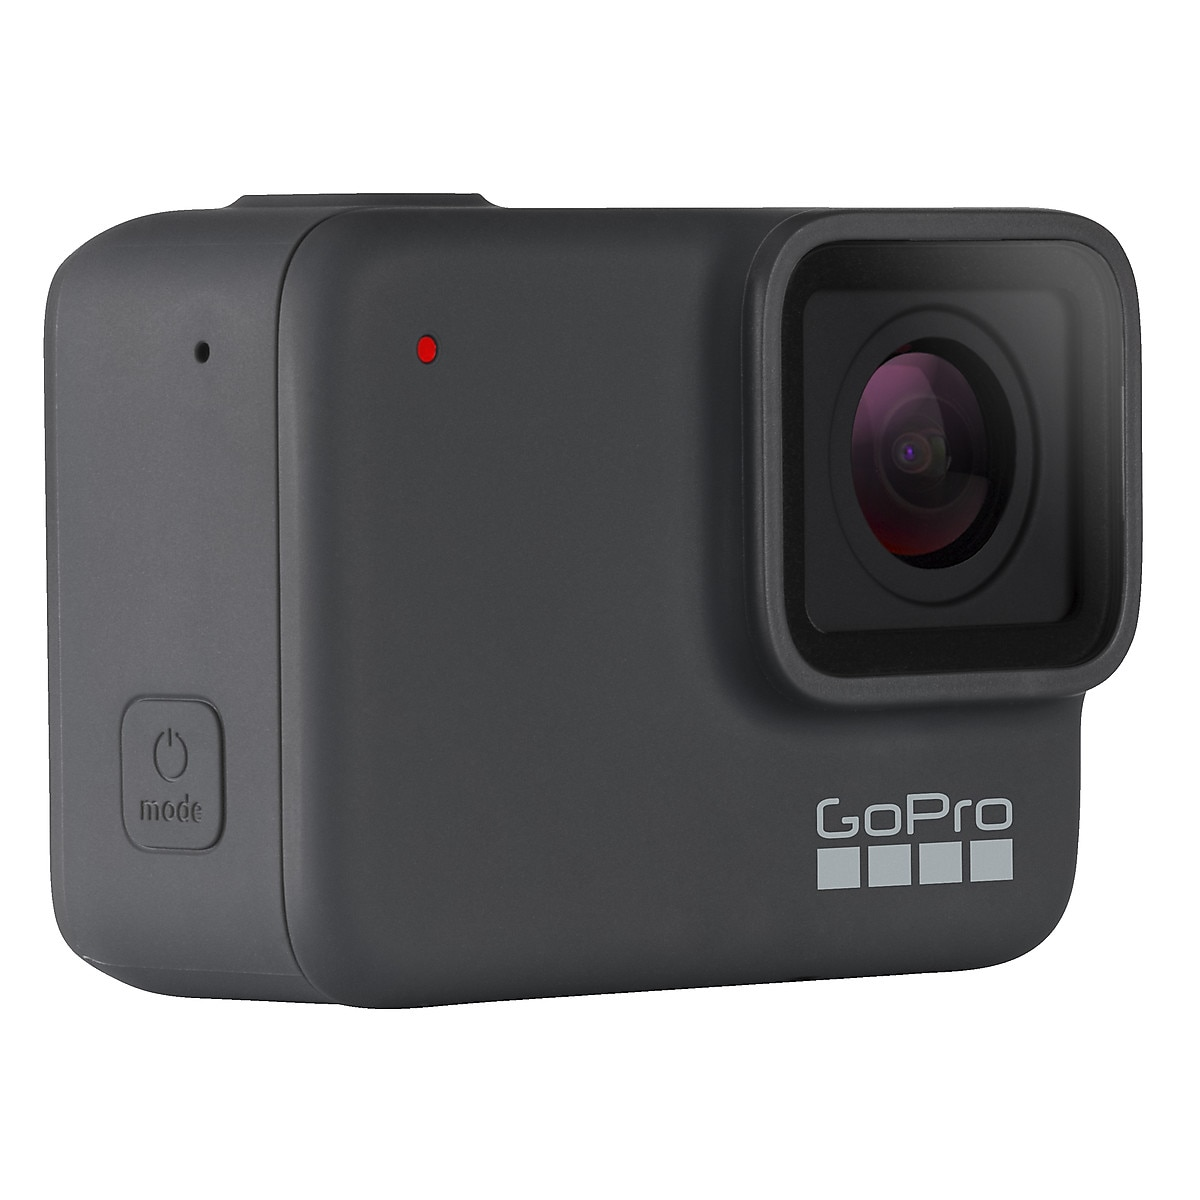 Actionkamera GoPro HERO7 Silver